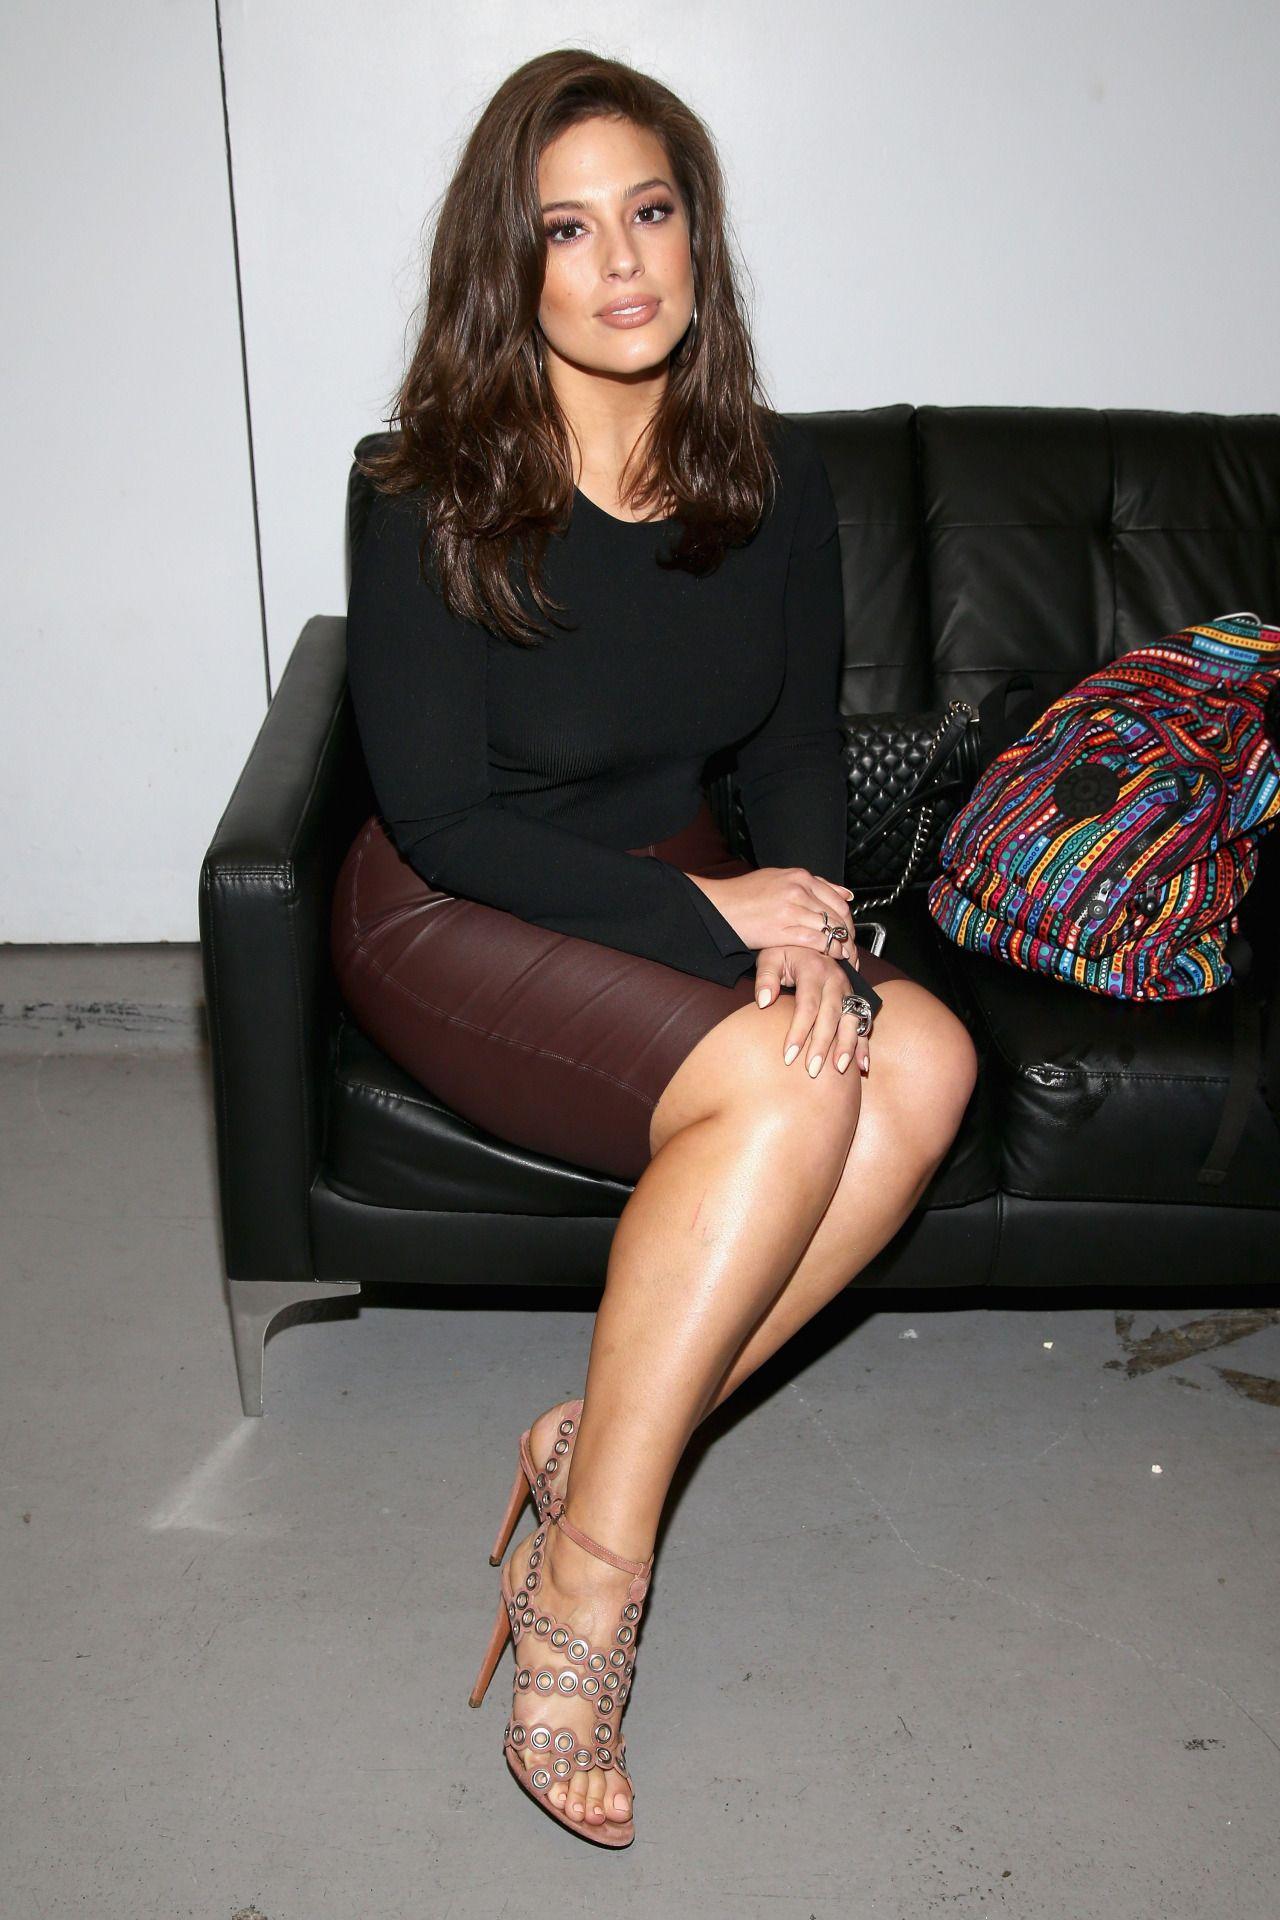 Kurvige Latina Ass Bilder